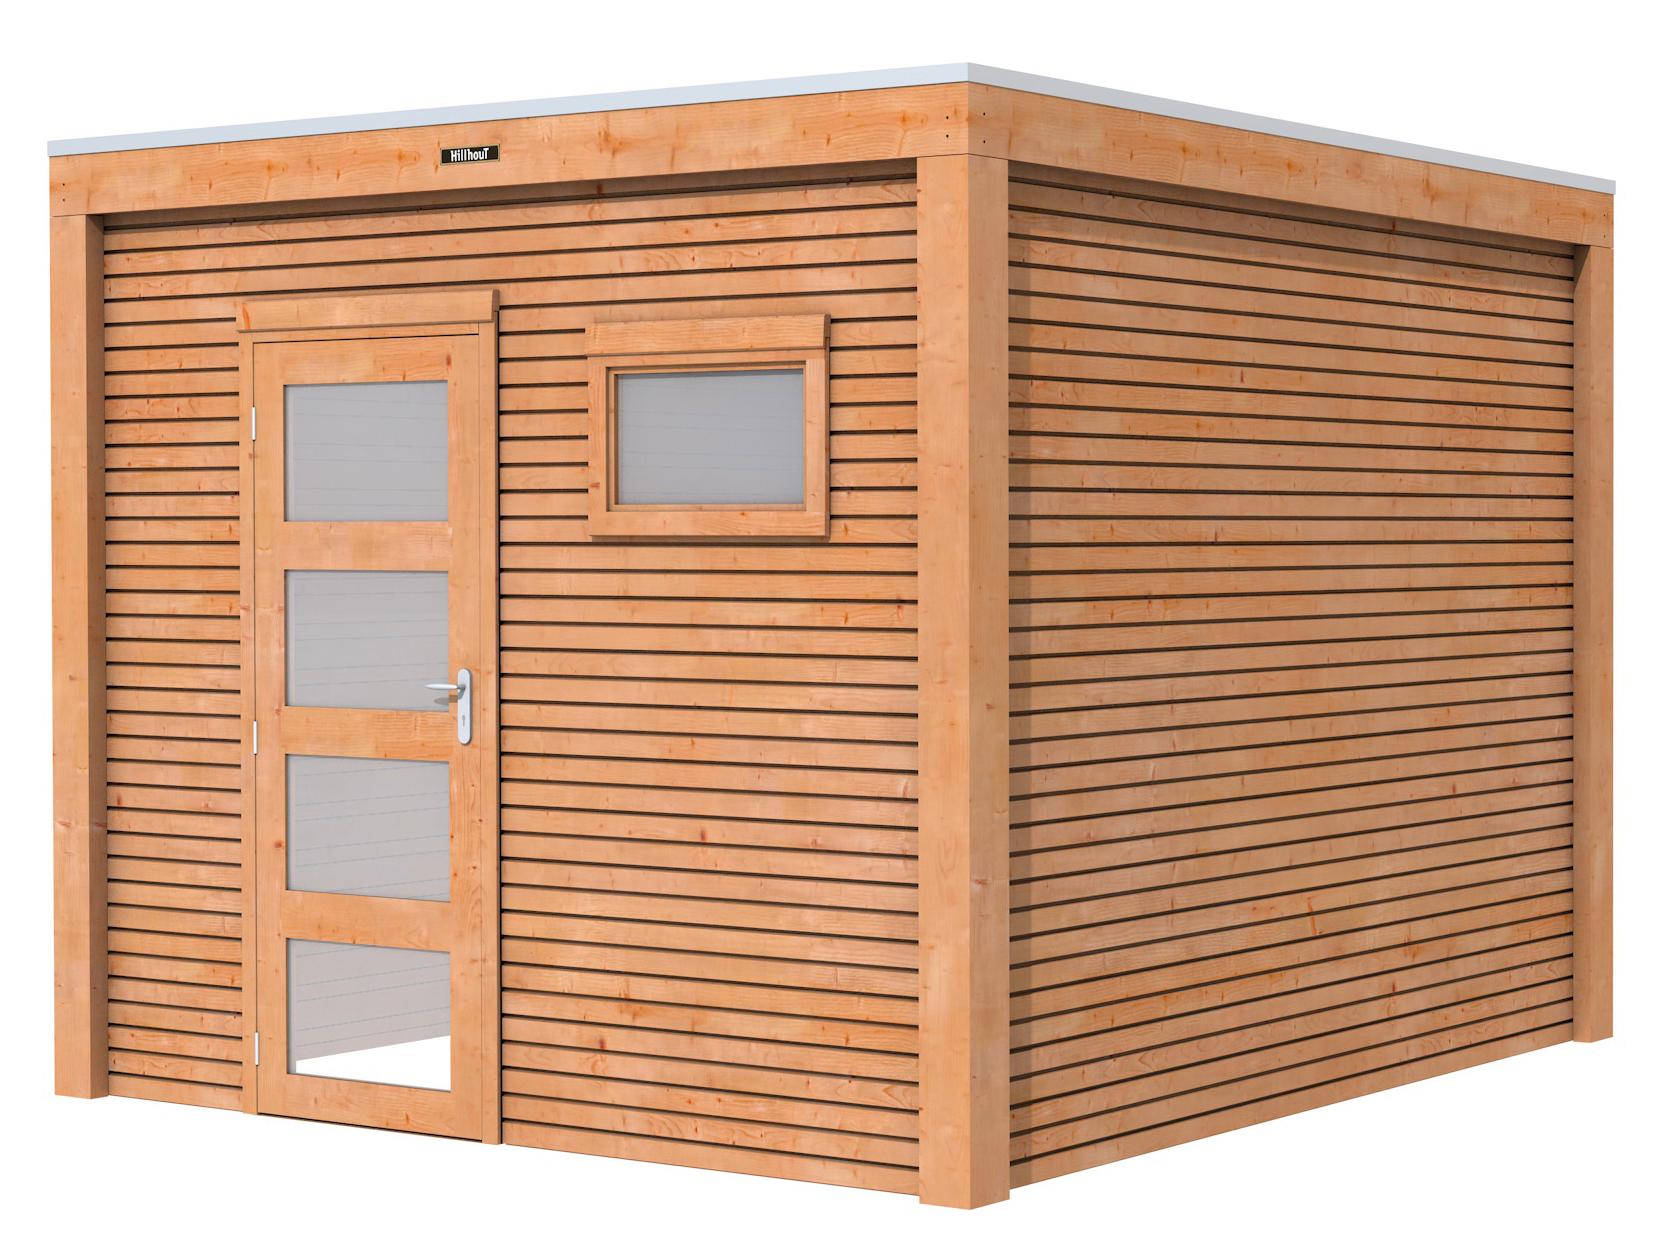 douglasie gartenh user online g nstig kaufen. Black Bedroom Furniture Sets. Home Design Ideas